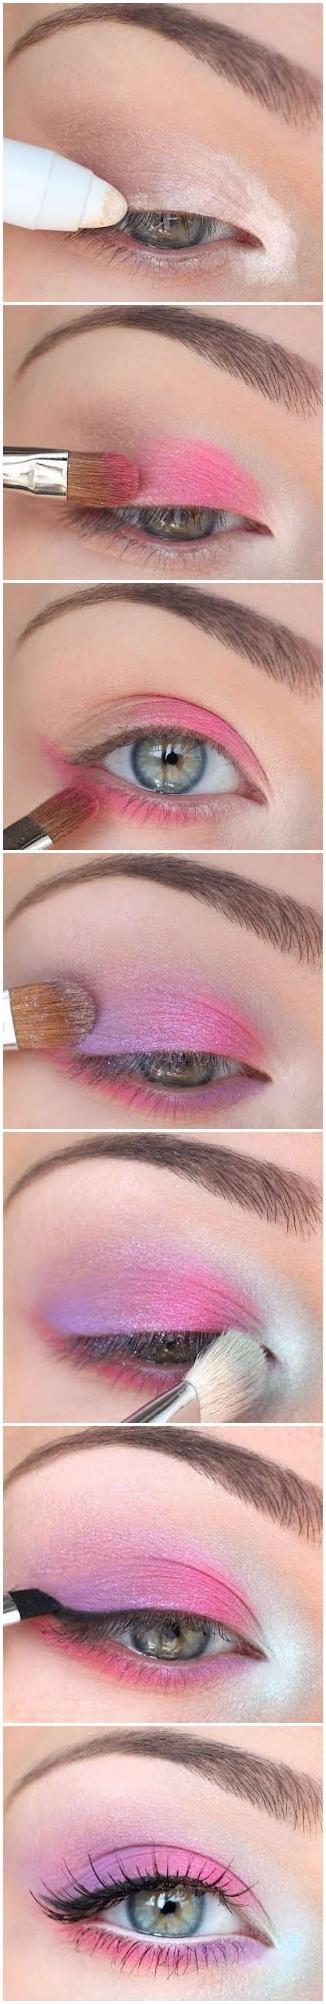 Maquillaje rosa paso a paso